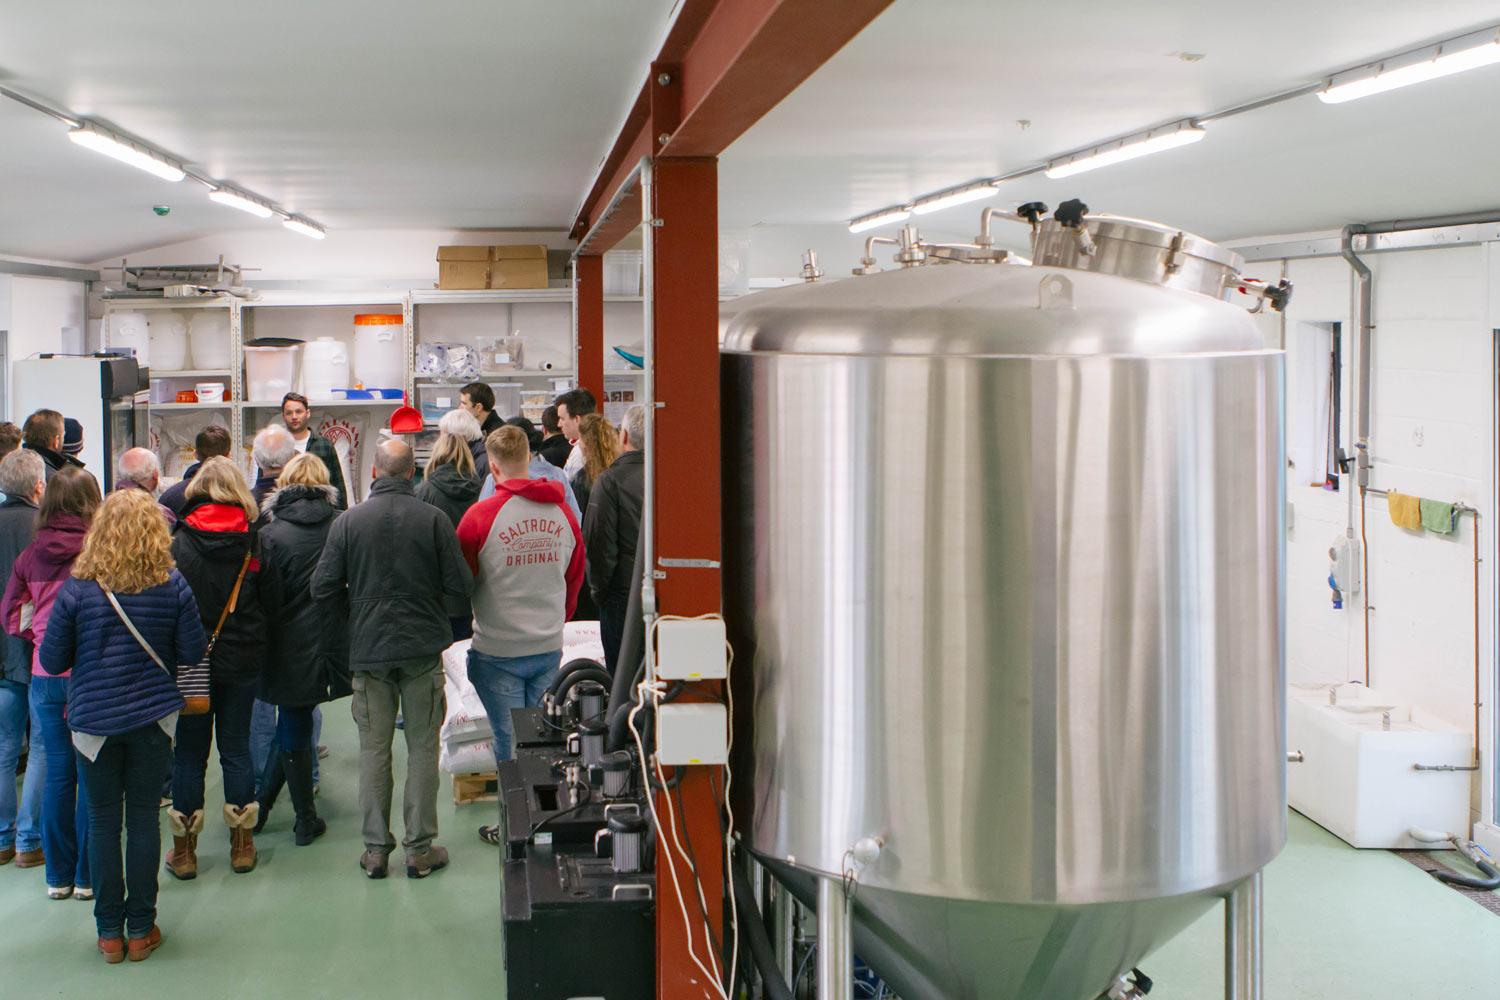 blackpit-brewery-birthday-party-001.jpg